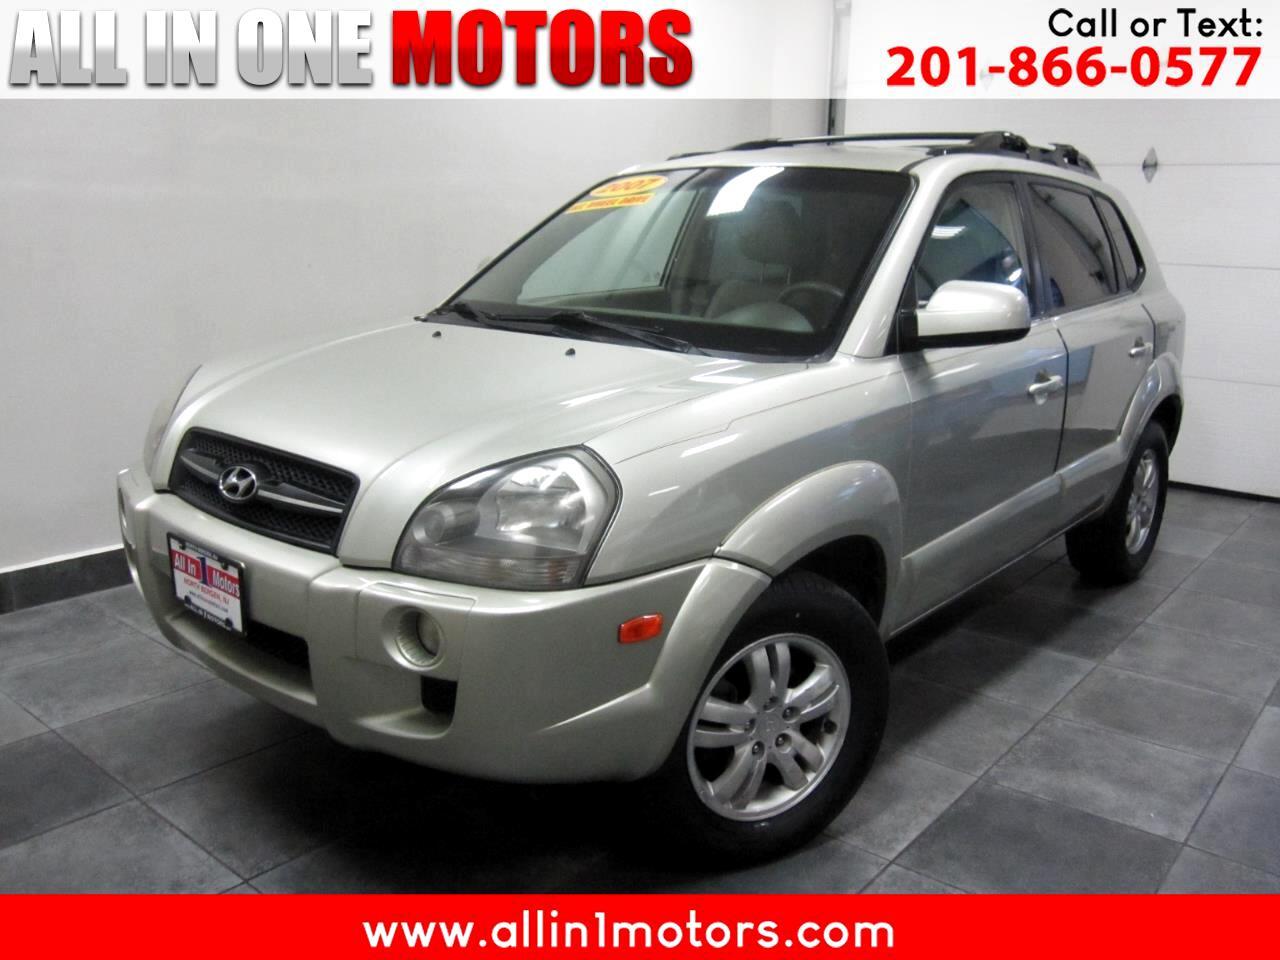 2007 Hyundai Tucson 4WD 4dr Auto Limited